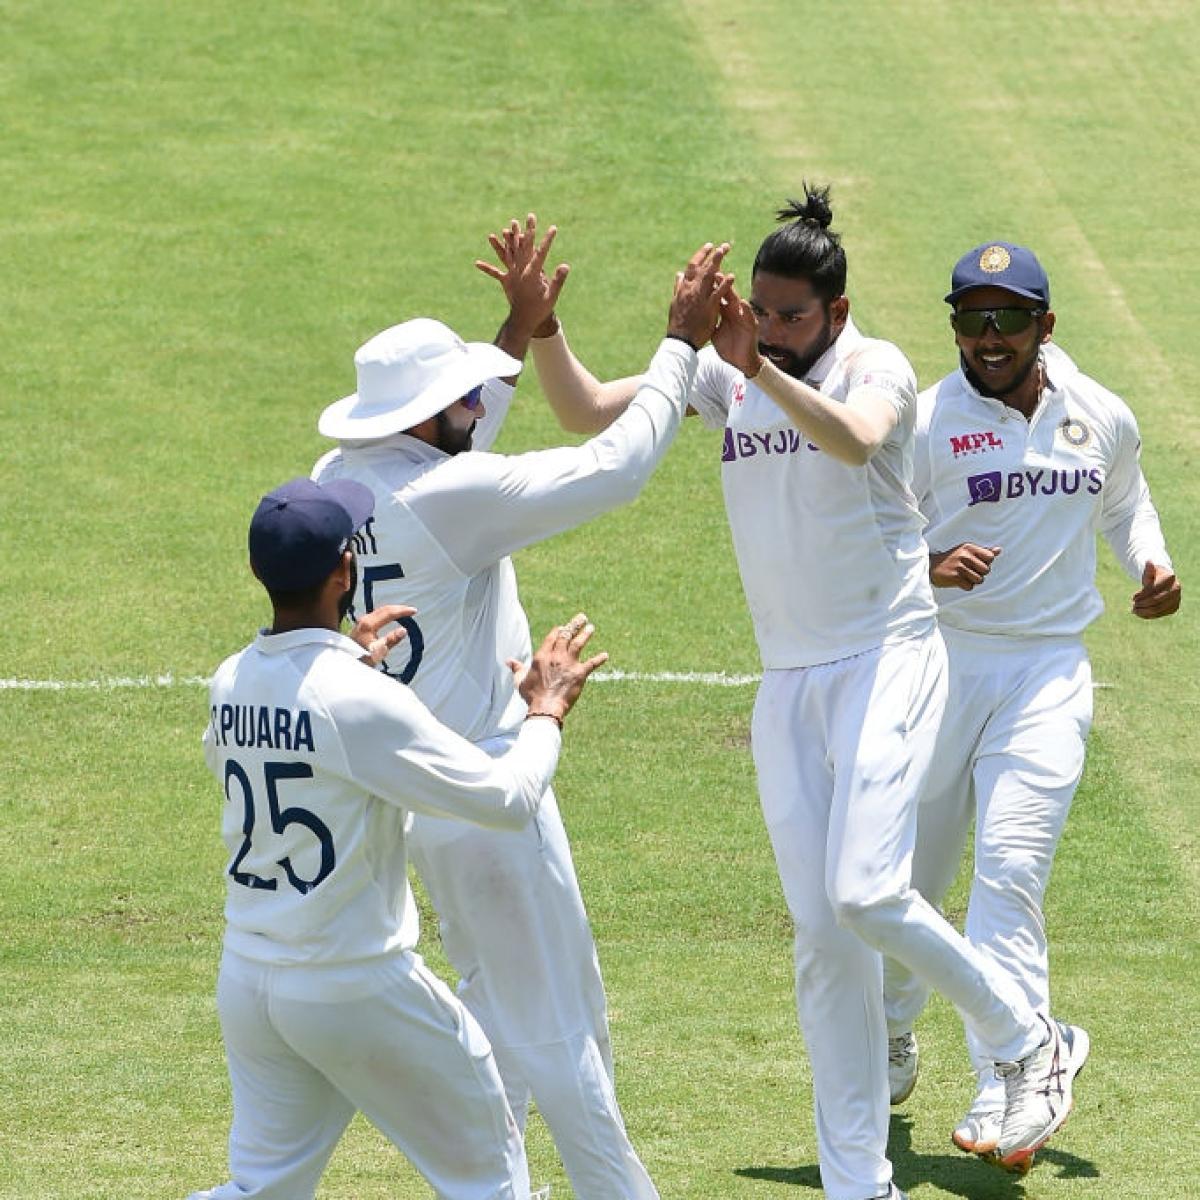 Ind vs Aus, 4th Test: Mohammed Siraj scripts maiden Test fifer